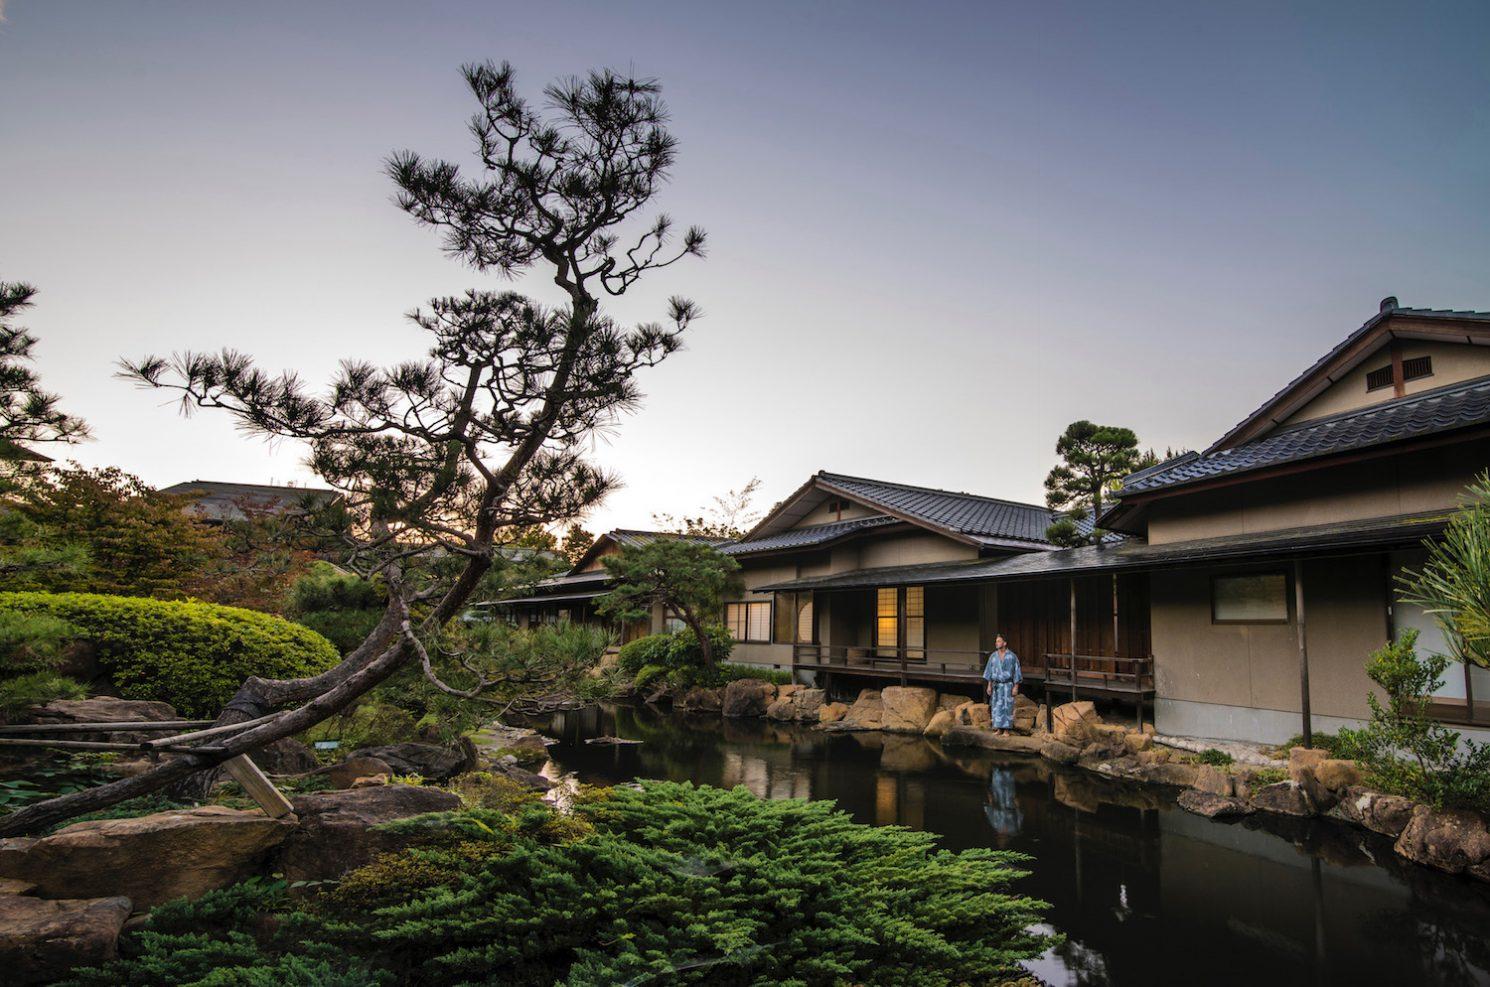 Japan in Practical Terms